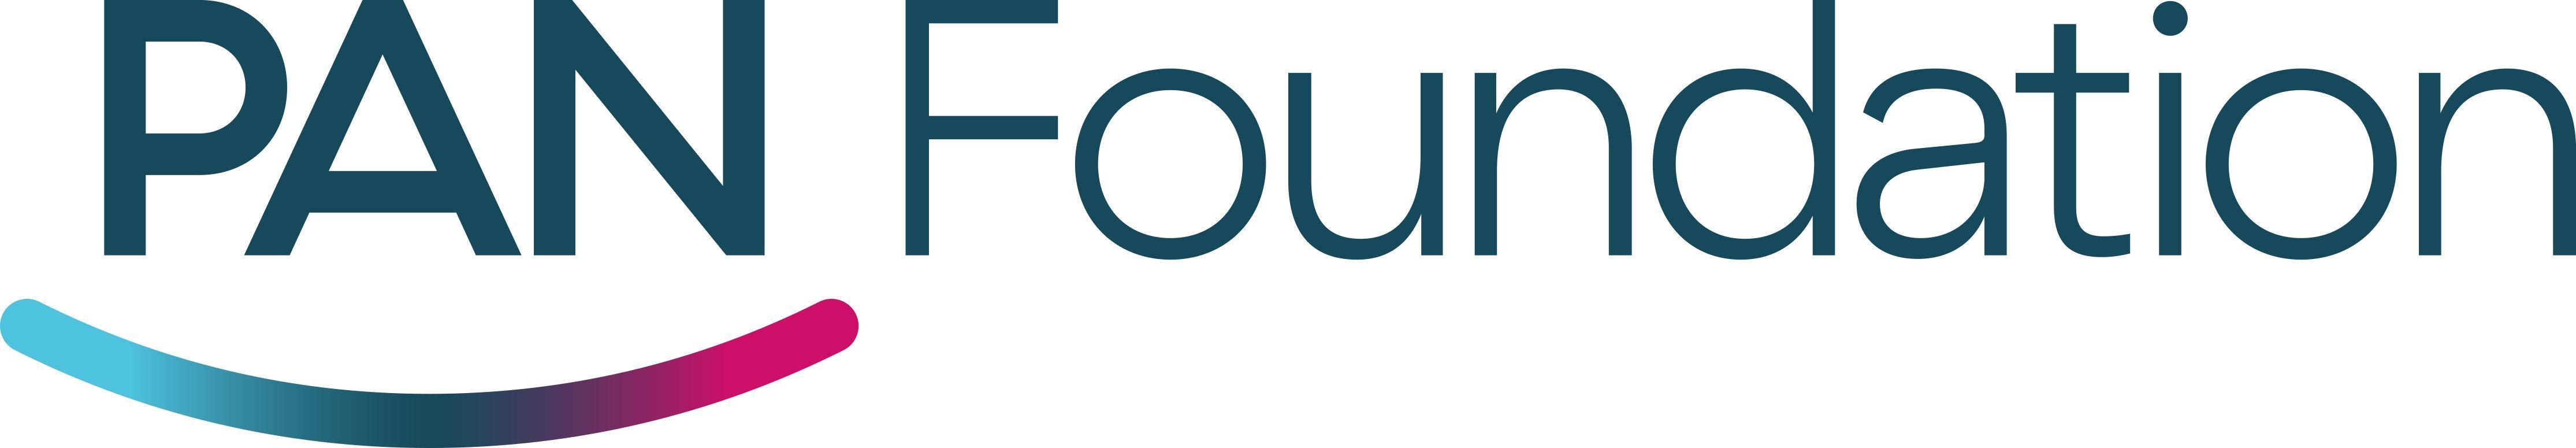 Patient Access Network Foundation